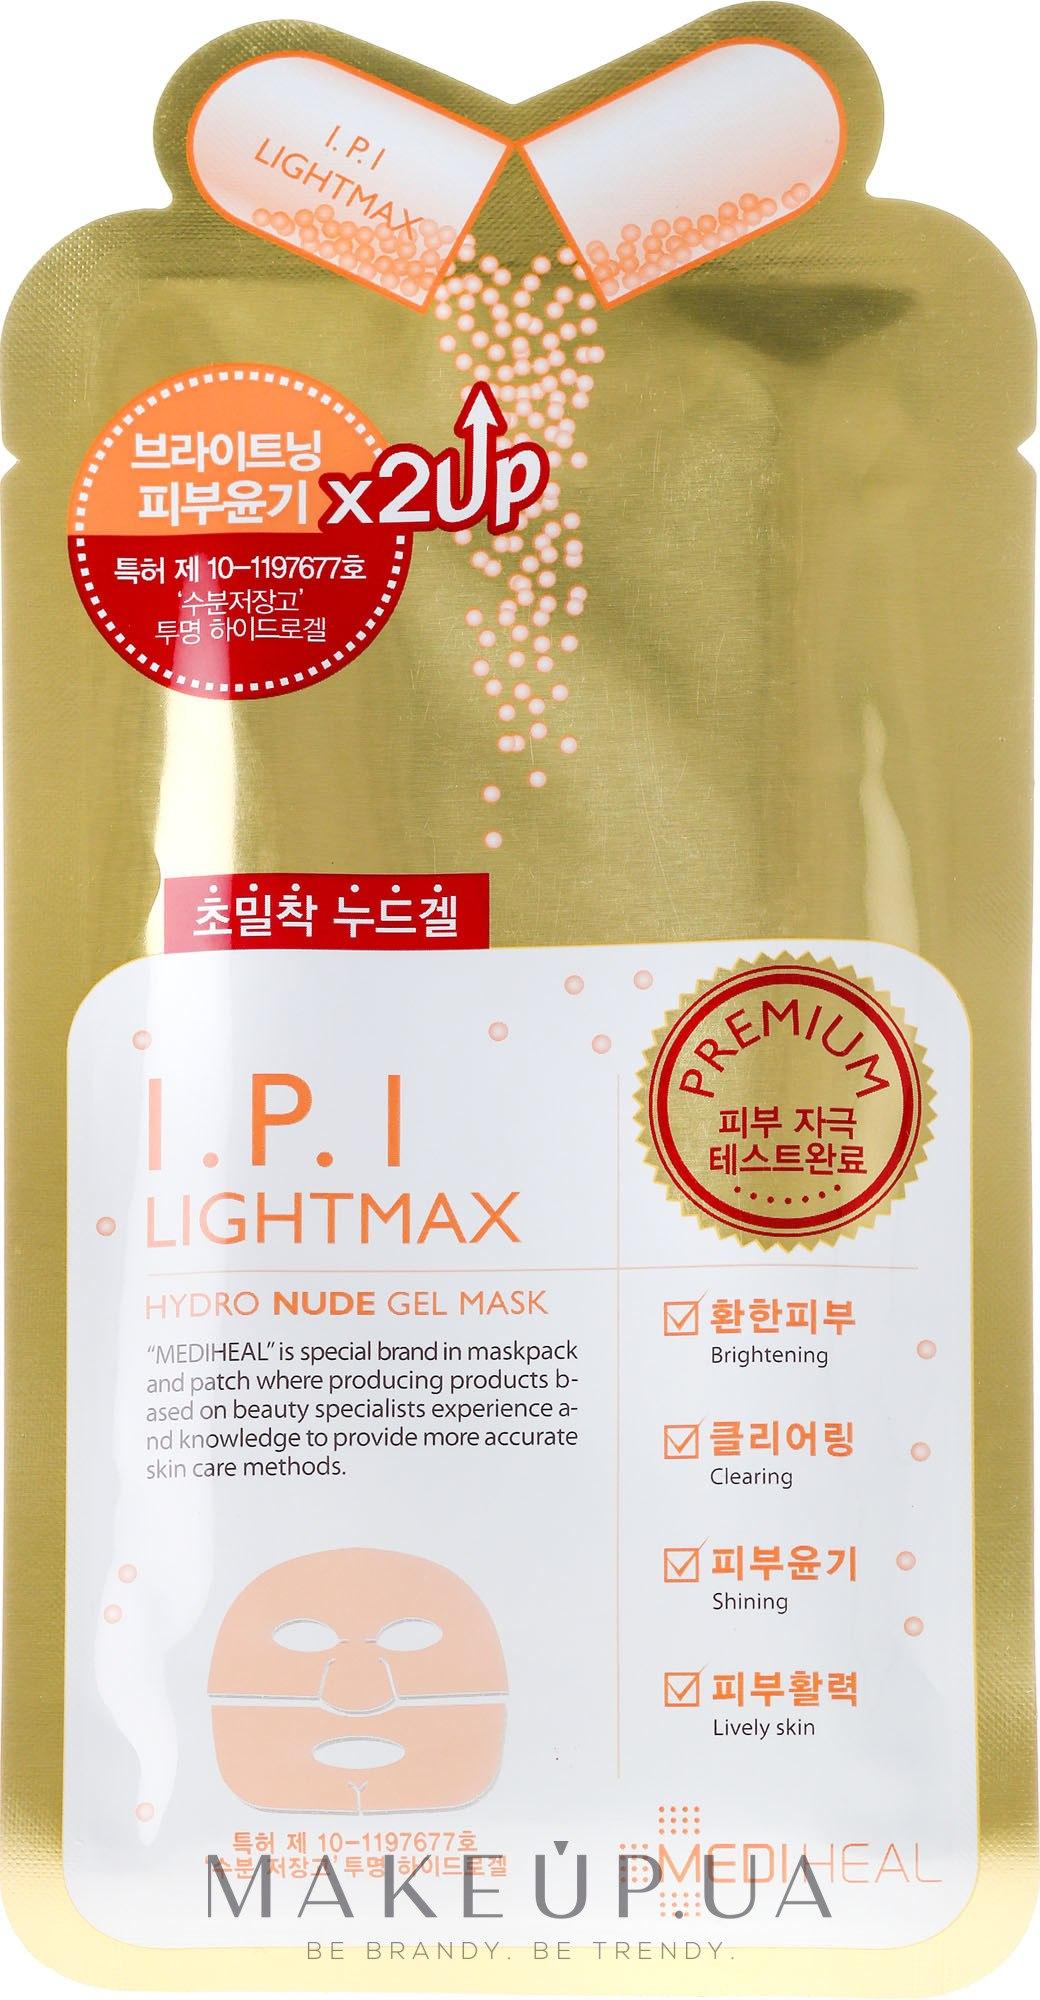 Mediheal I.P.I. Lightmax Hydro Nude Gel Mask - MASKEPEDIA